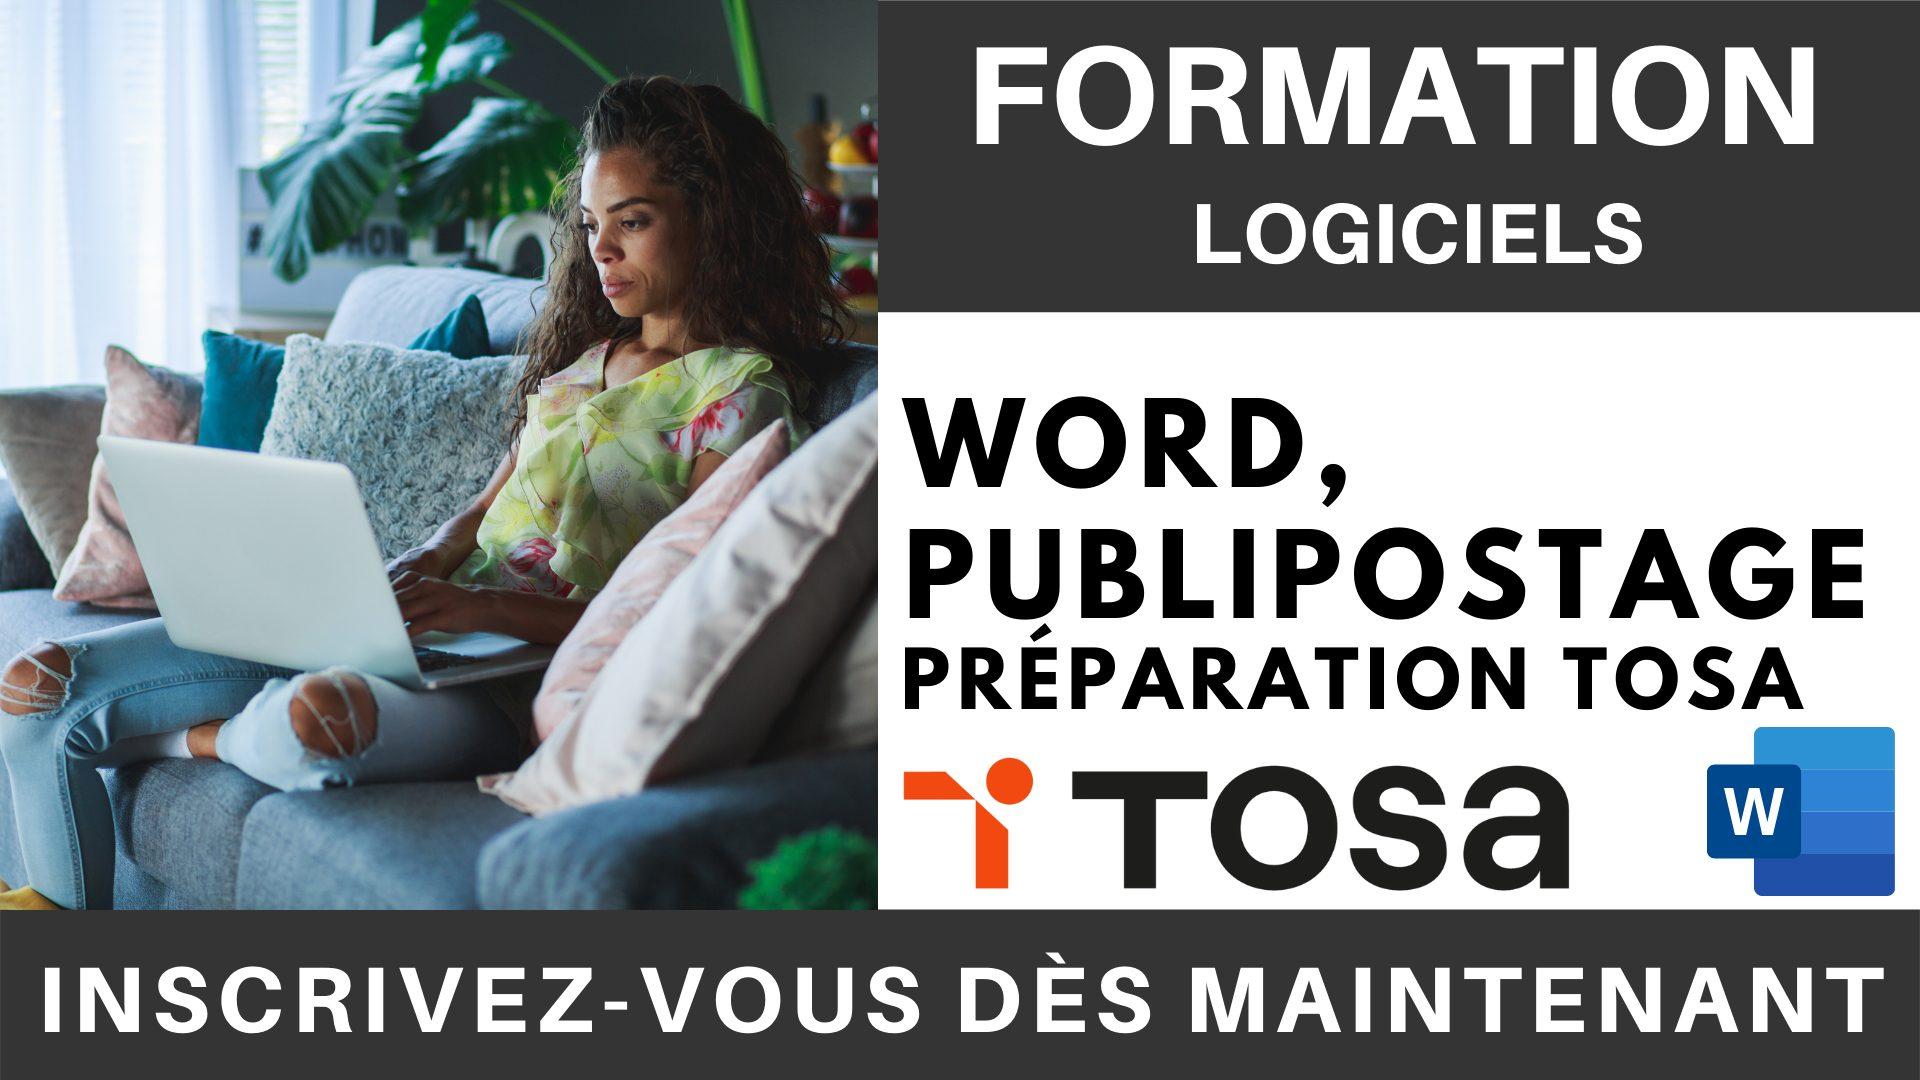 Formation LOGICIEL - Word, Publipostage - Préparation TOSA (1)